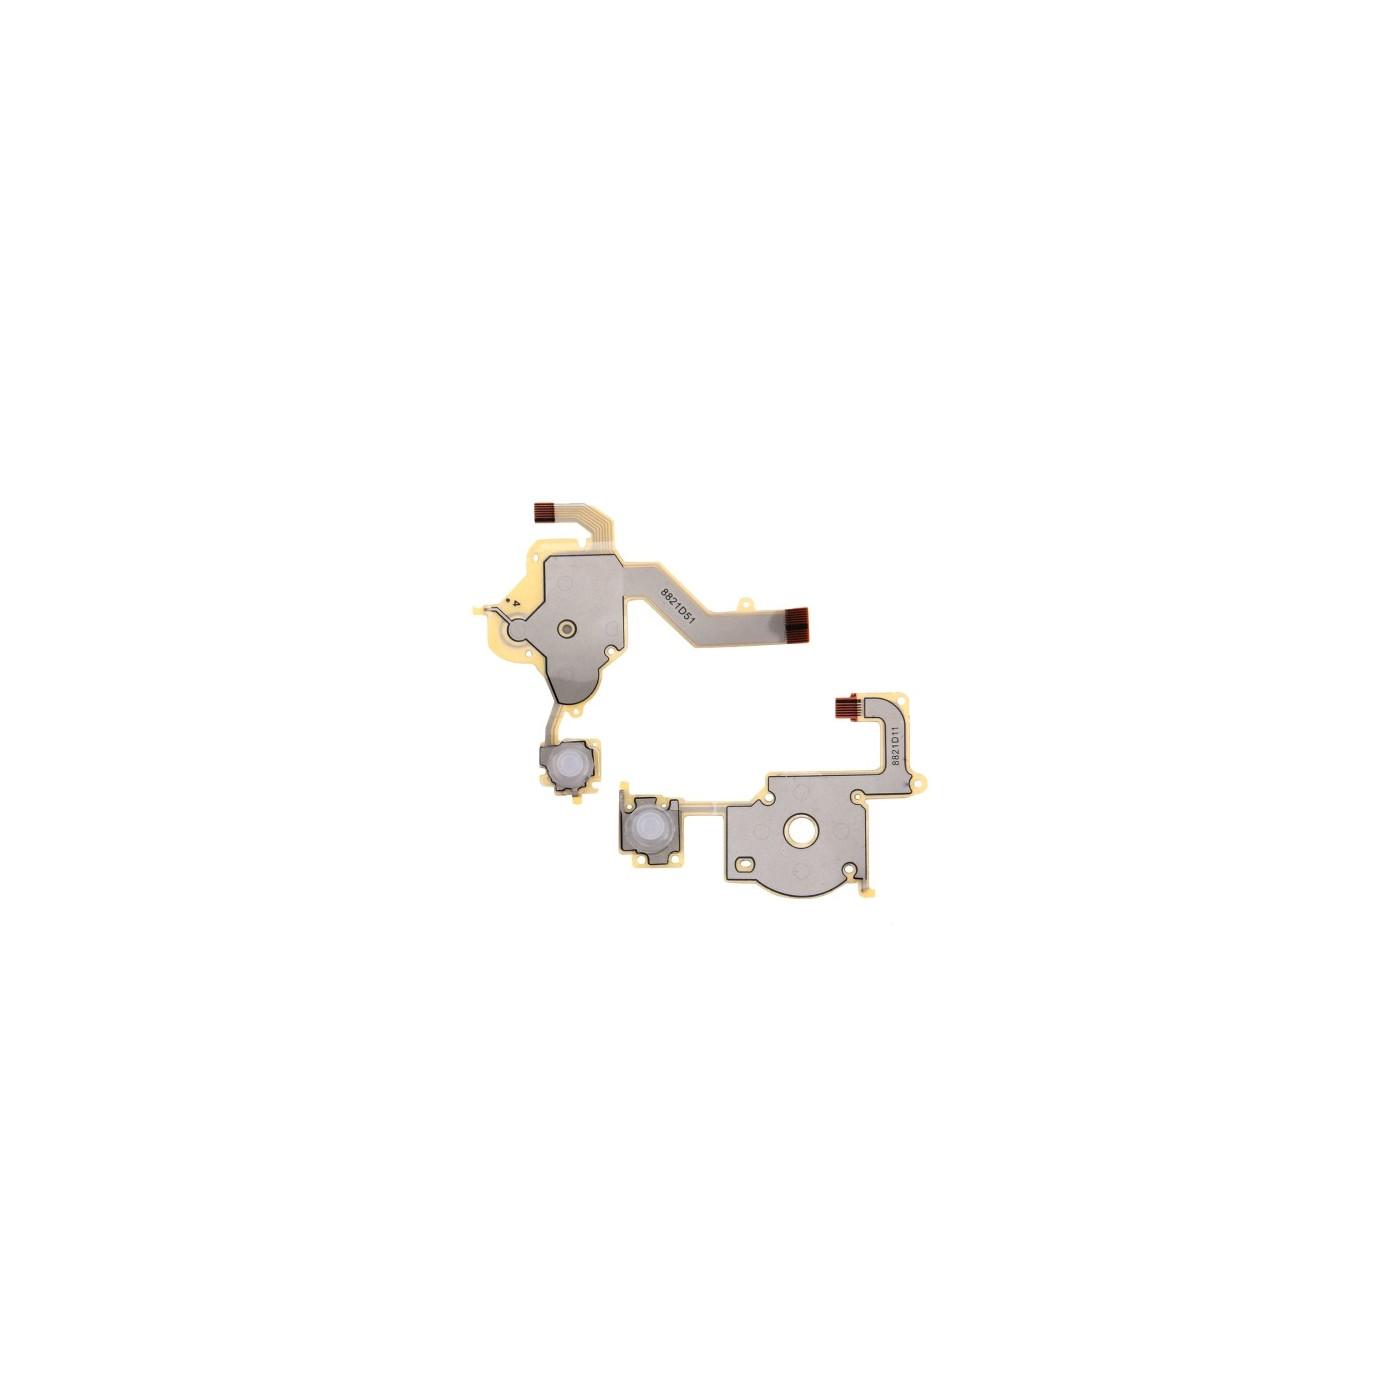 BOUTONS PUSH INTERNE PLATS SONY PSP 3000 3004 PCB DIRECTIONNEL GAUCHE DROIT